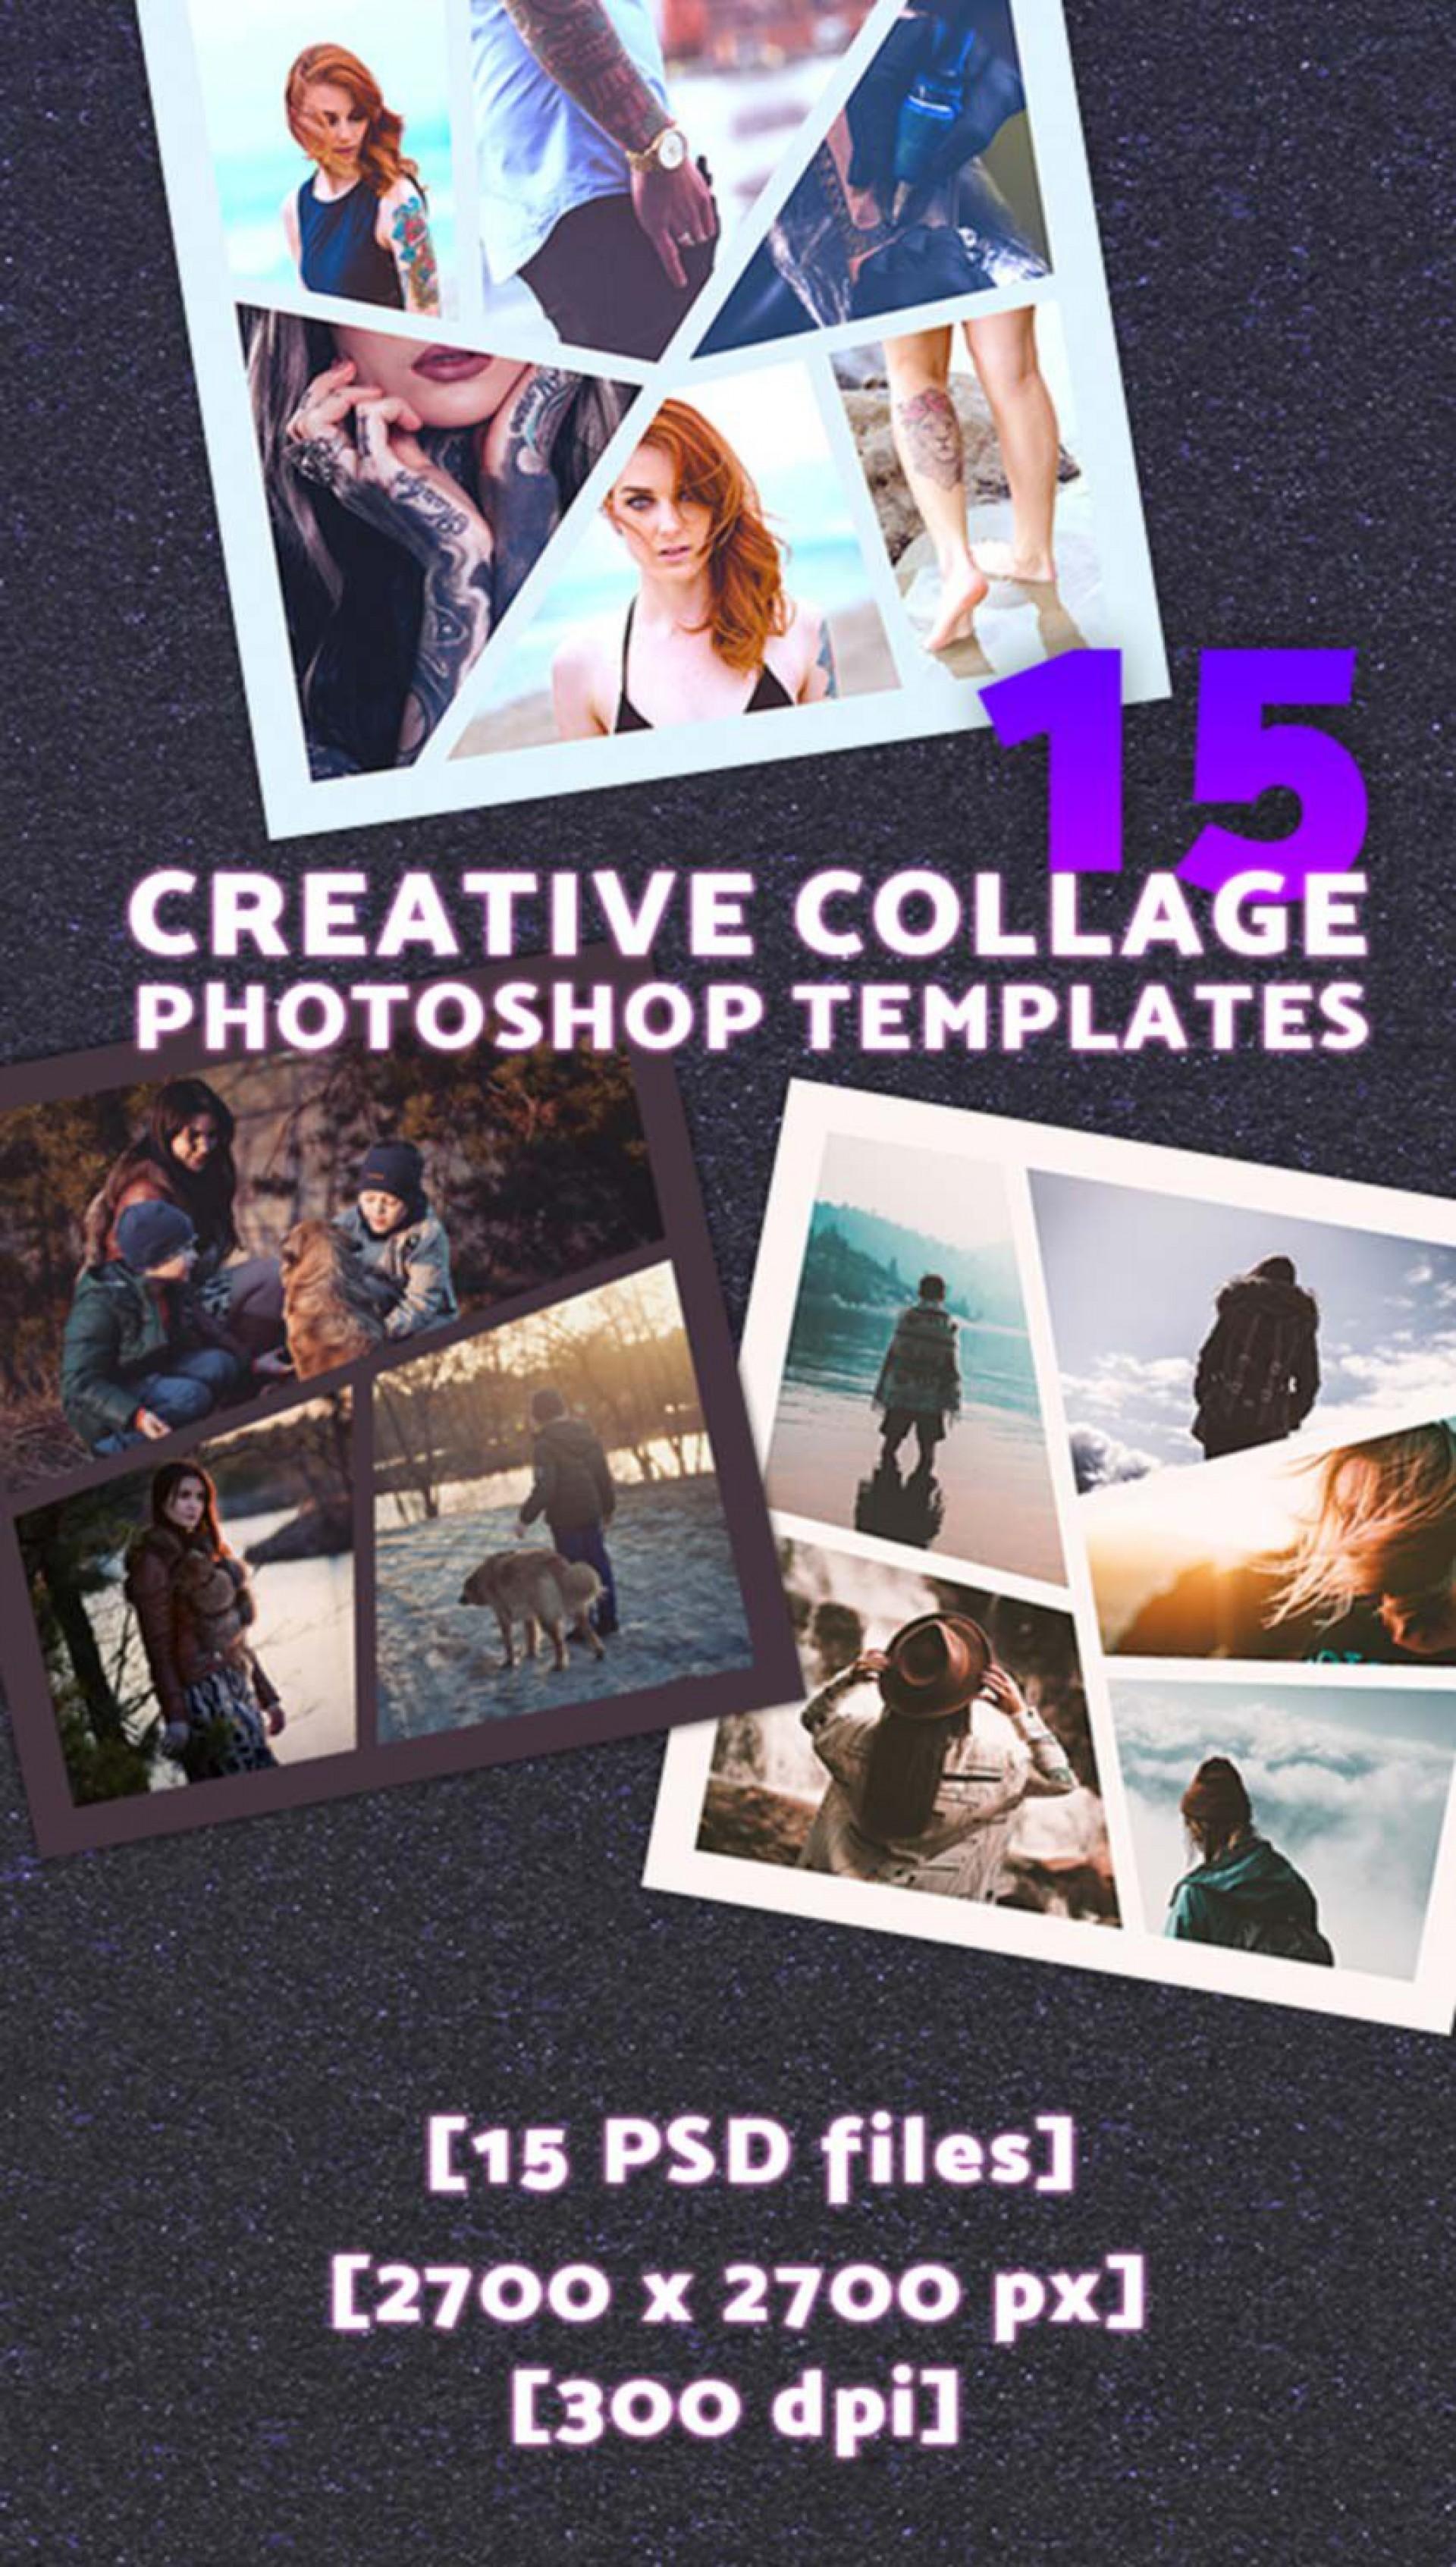 005 Impressive Free Download Template Picture Collage Maker Photo 1920